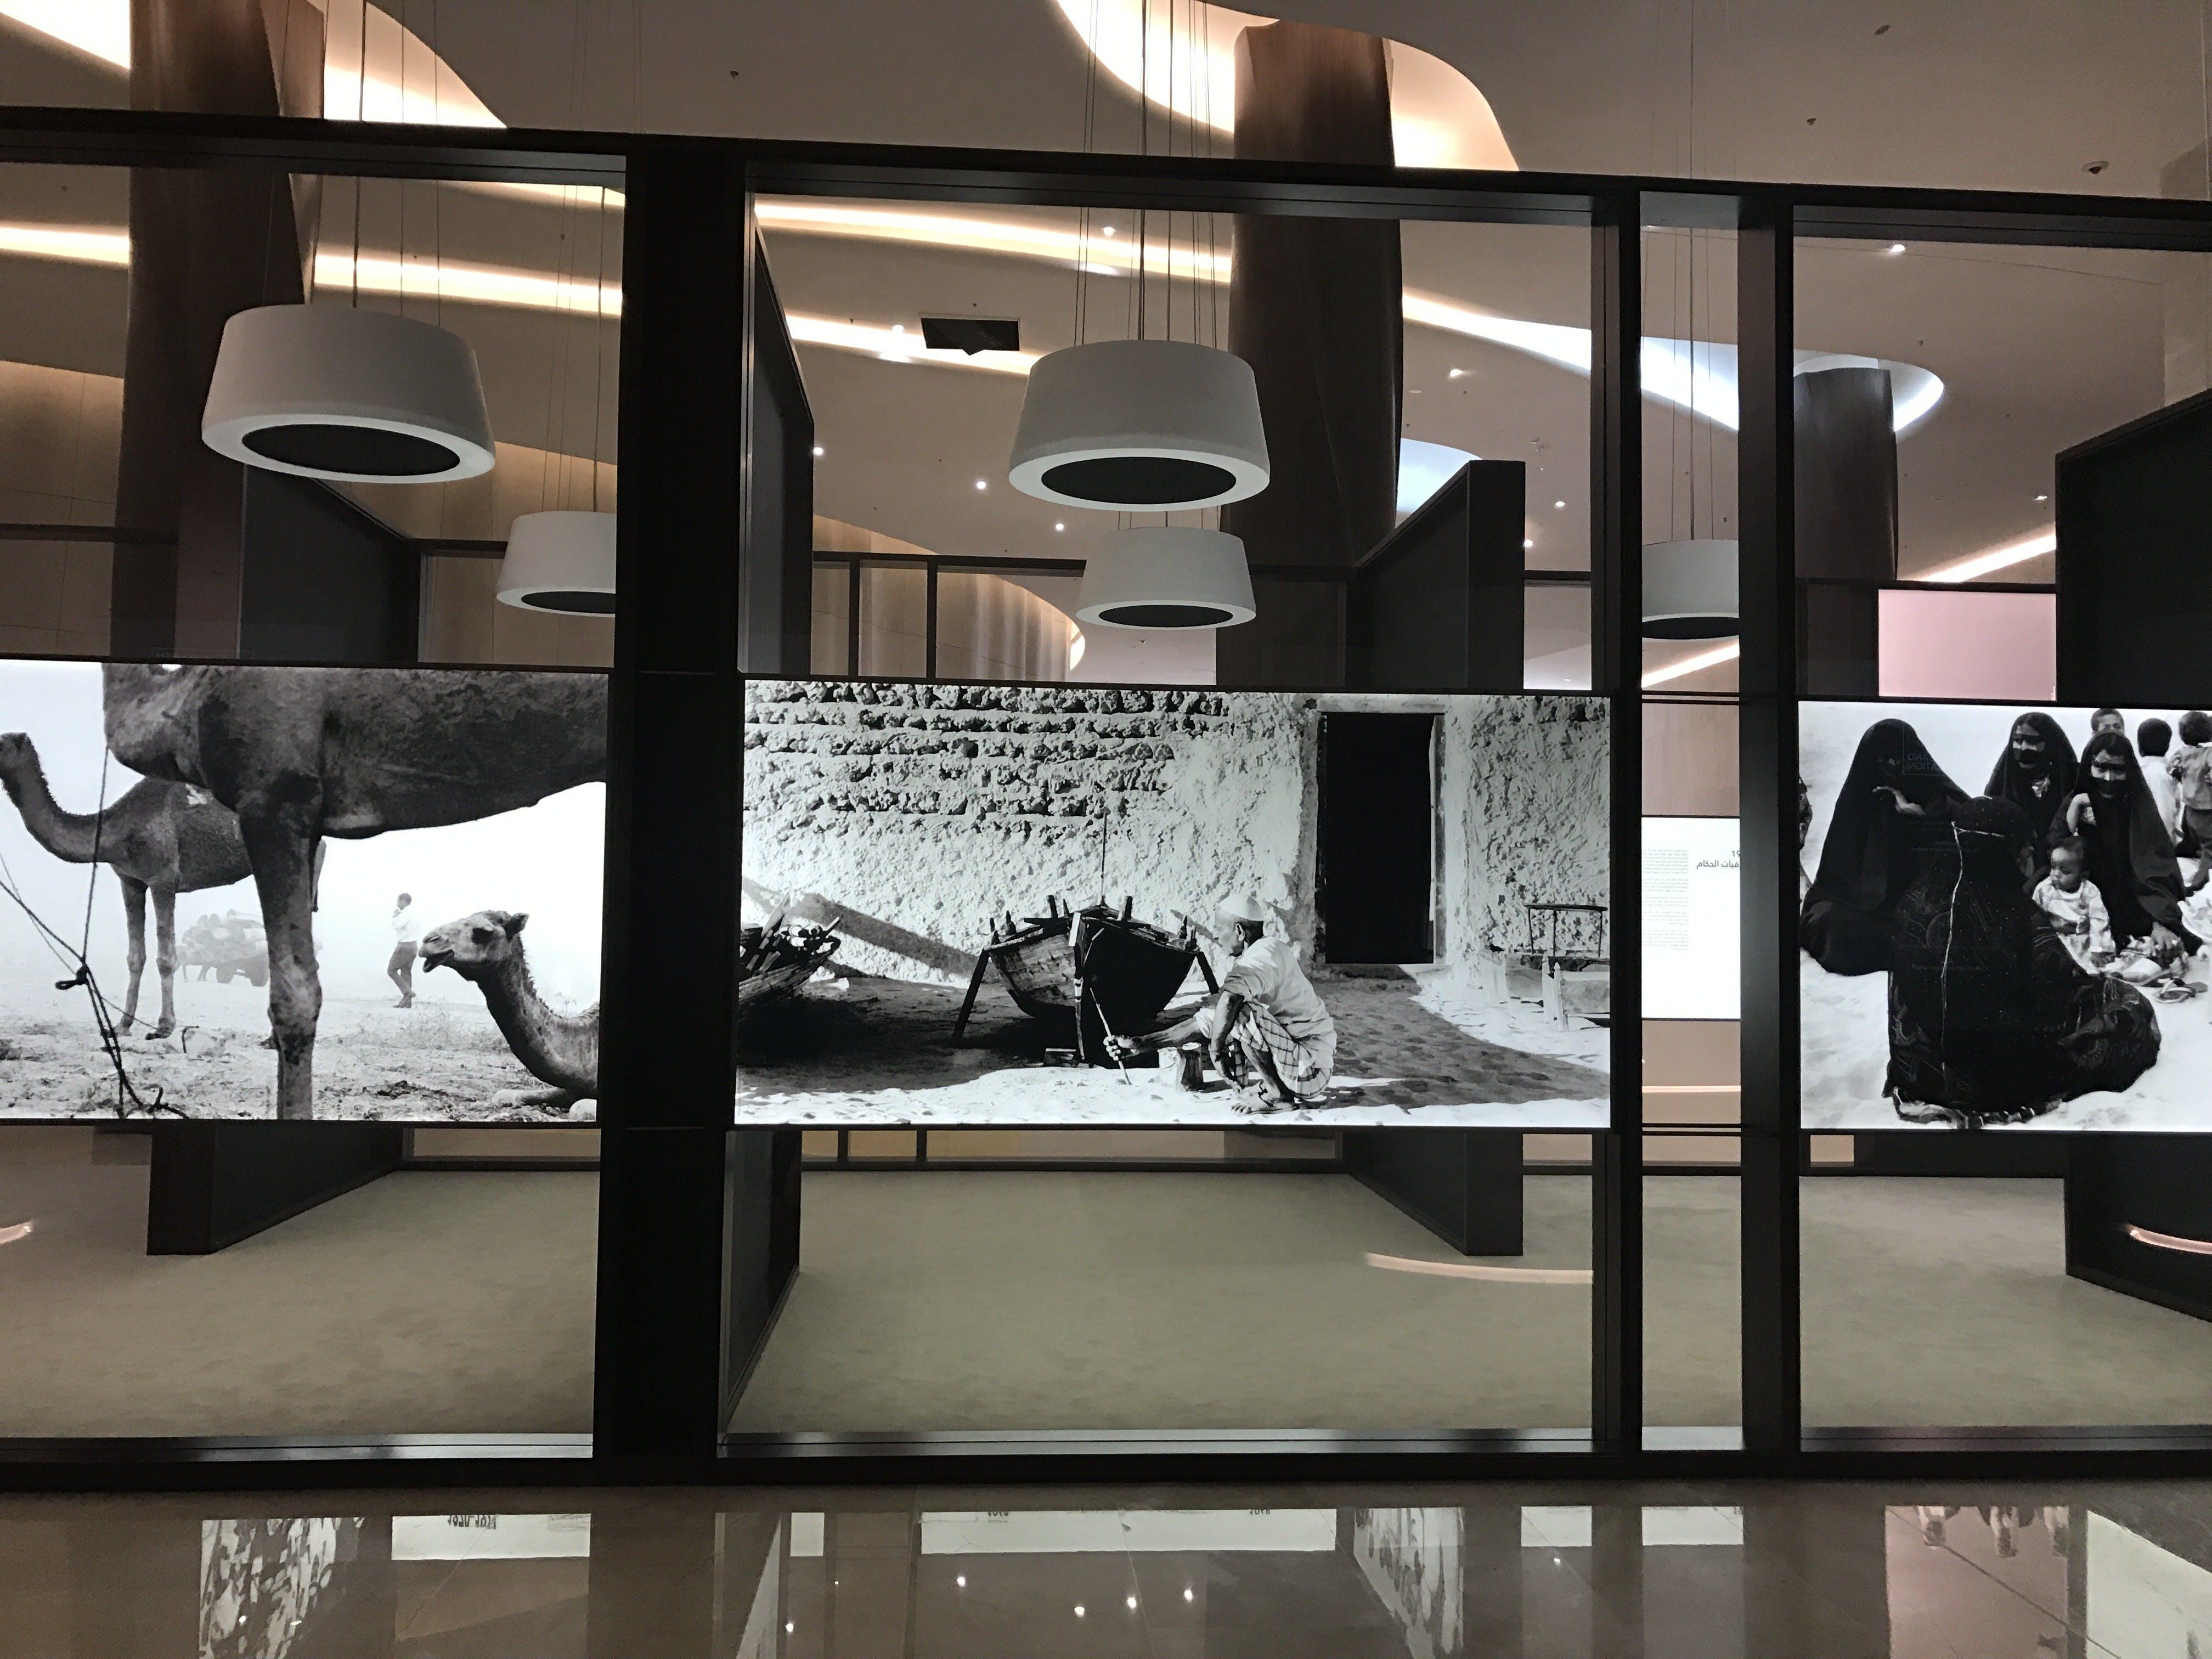 Fotos de Museo de Dubai Ethiad. JPG